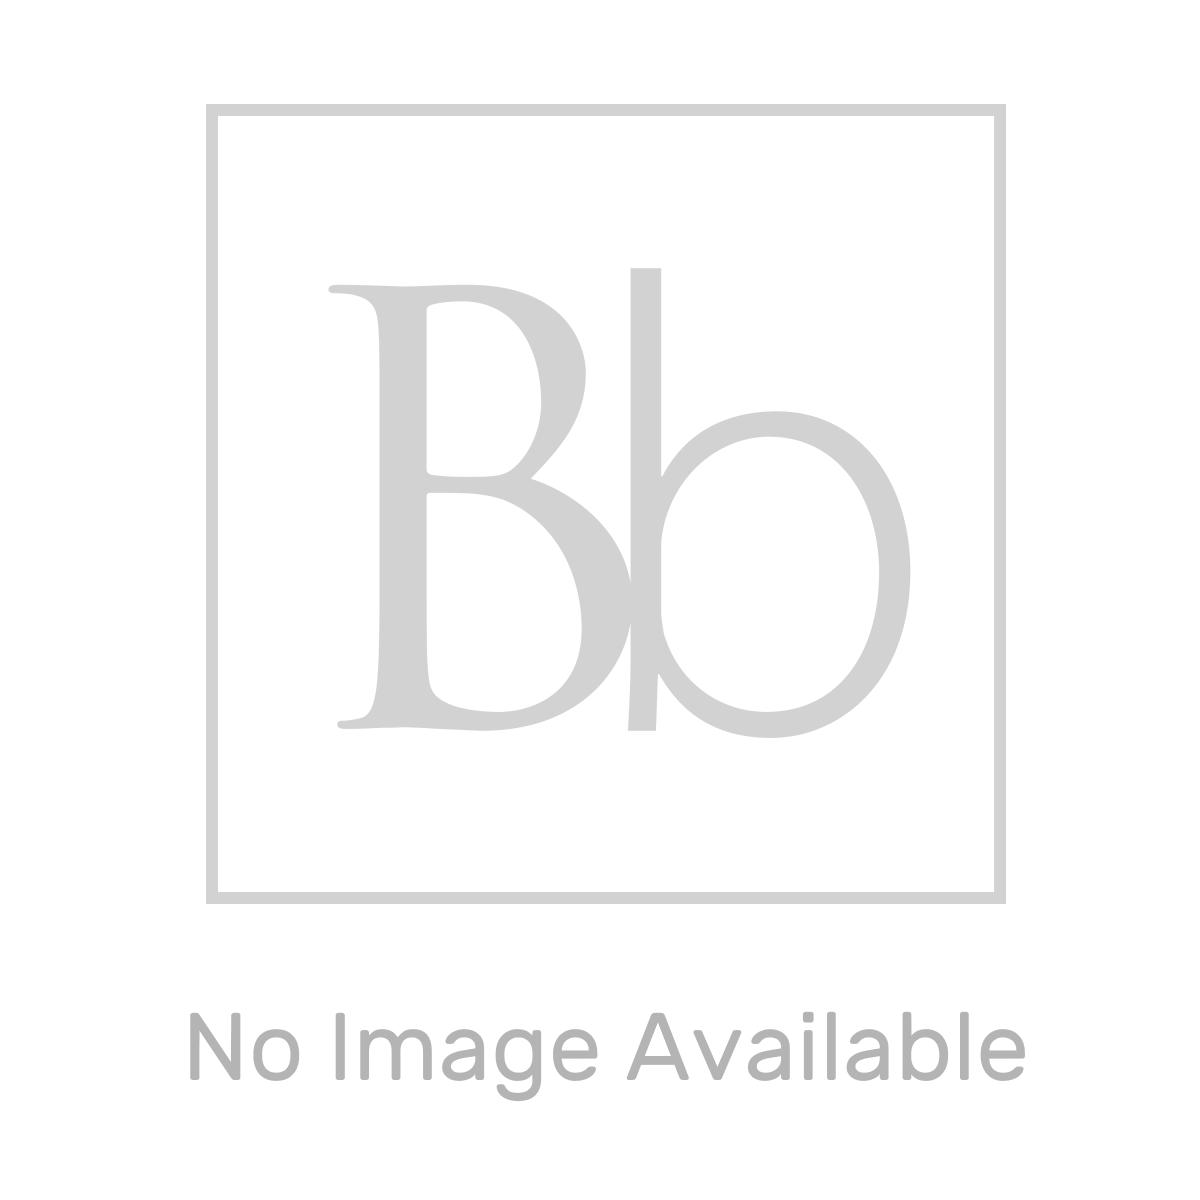 Salamander RP120SU 3.6 Bar Single Universal Whole House Shower Pump